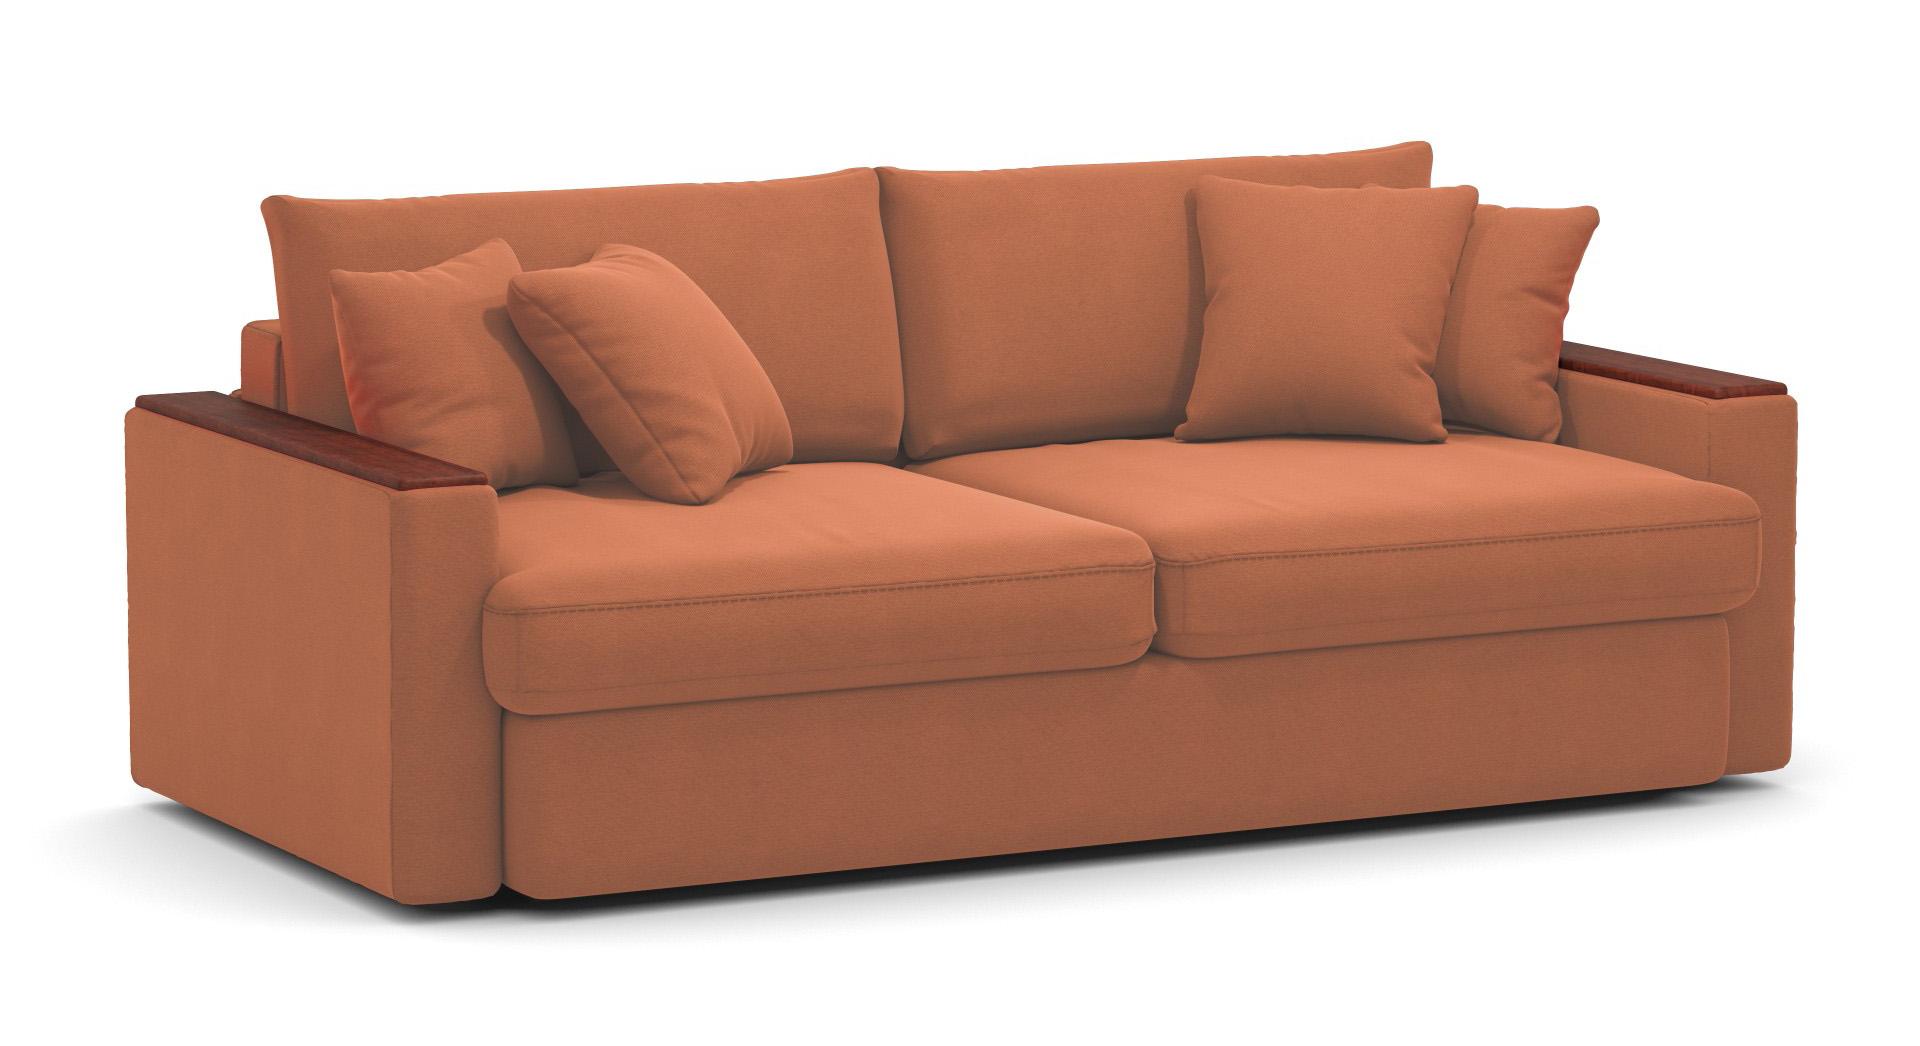 Фиеста диван еврокнижка Стелф 3